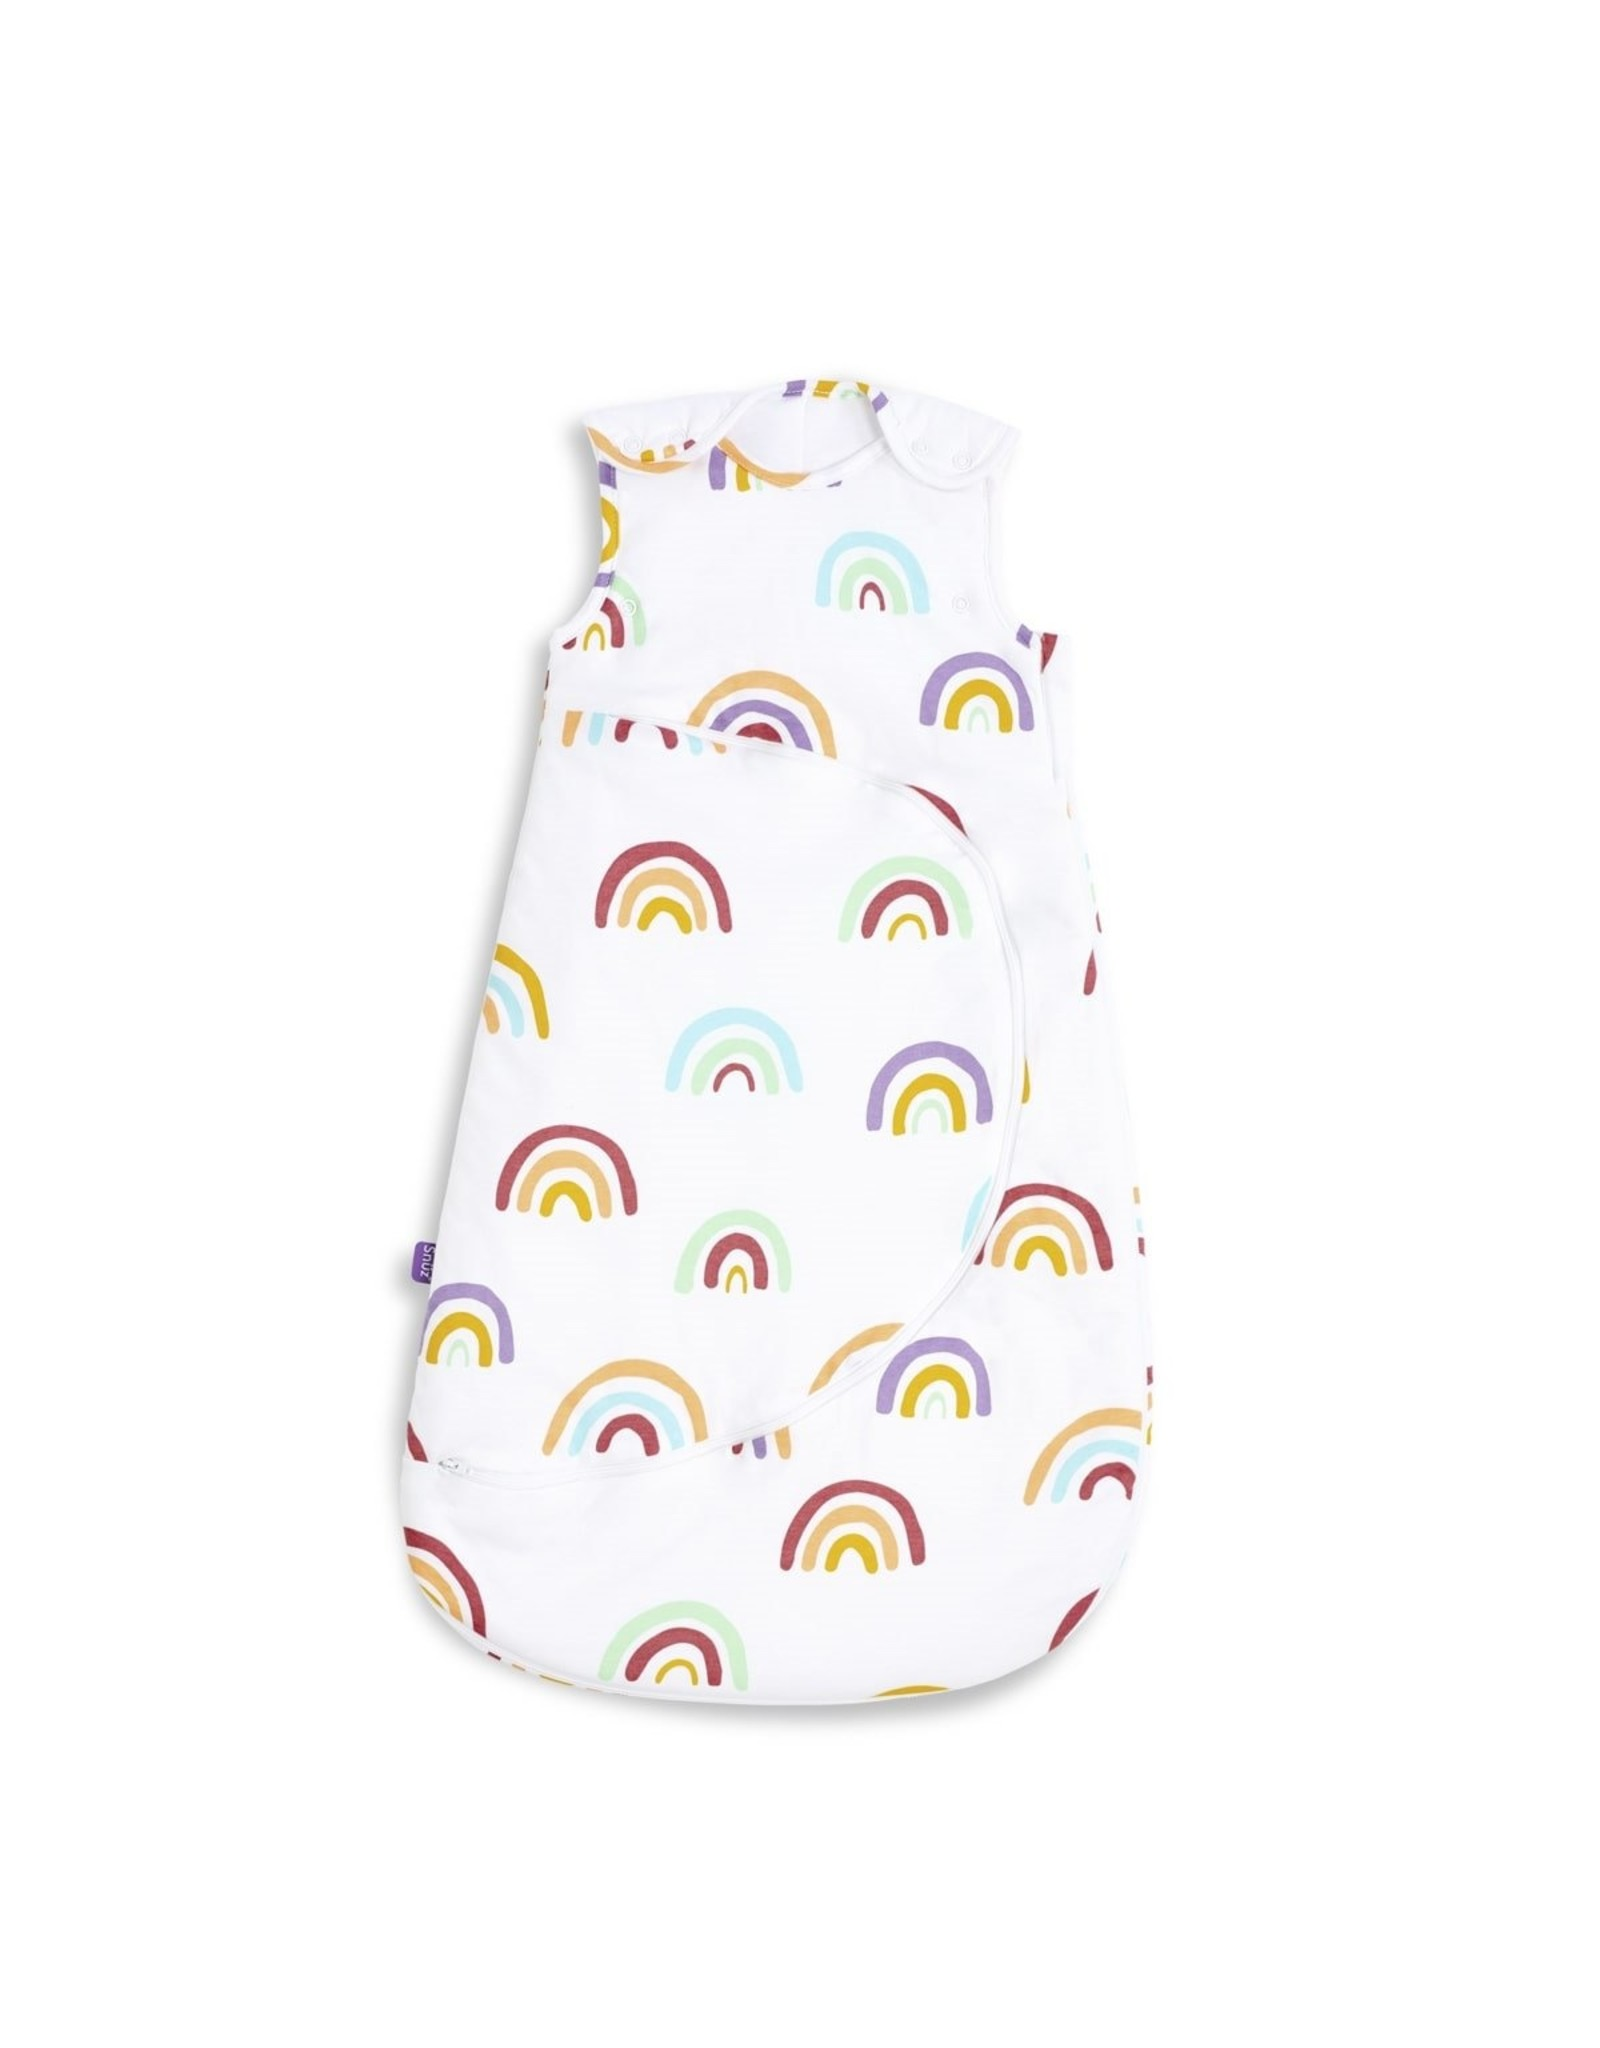 Snuz SnuzPouch Sleeping Bag - Rainbow- 1 Tog & 2.5 Tog